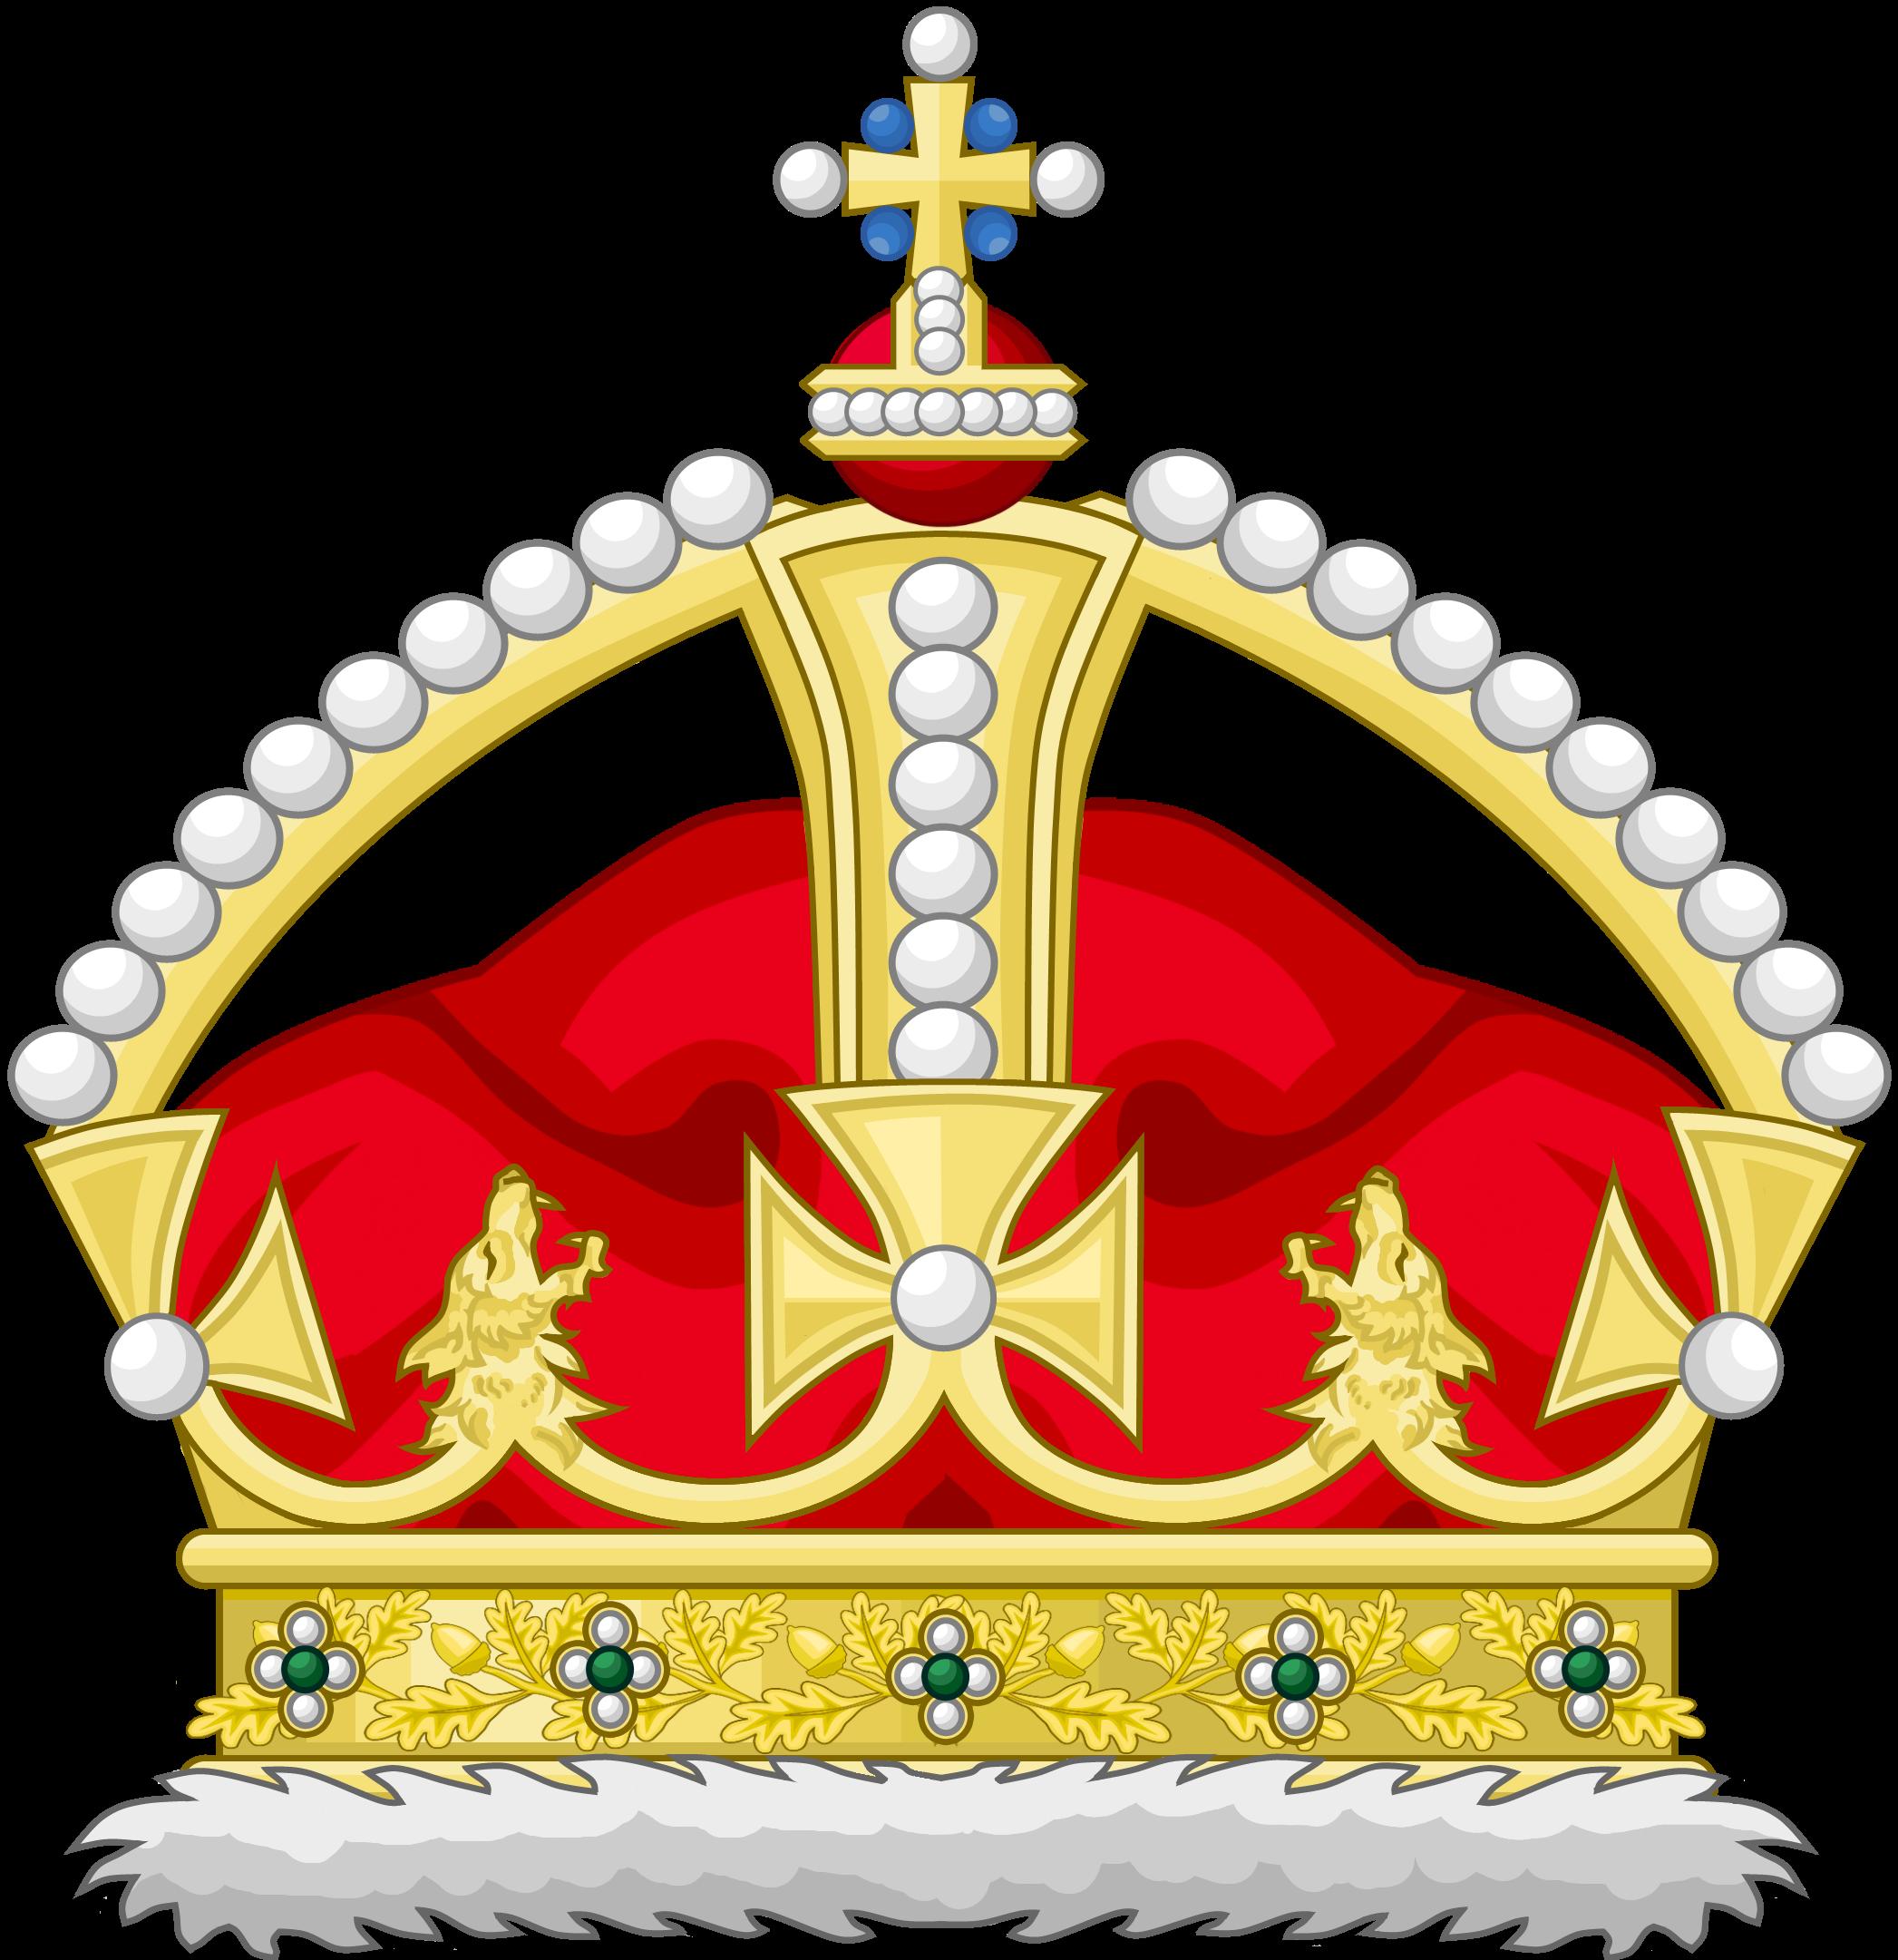 crown royal crown of denmark c 1670 royal crown of denmark a helmet